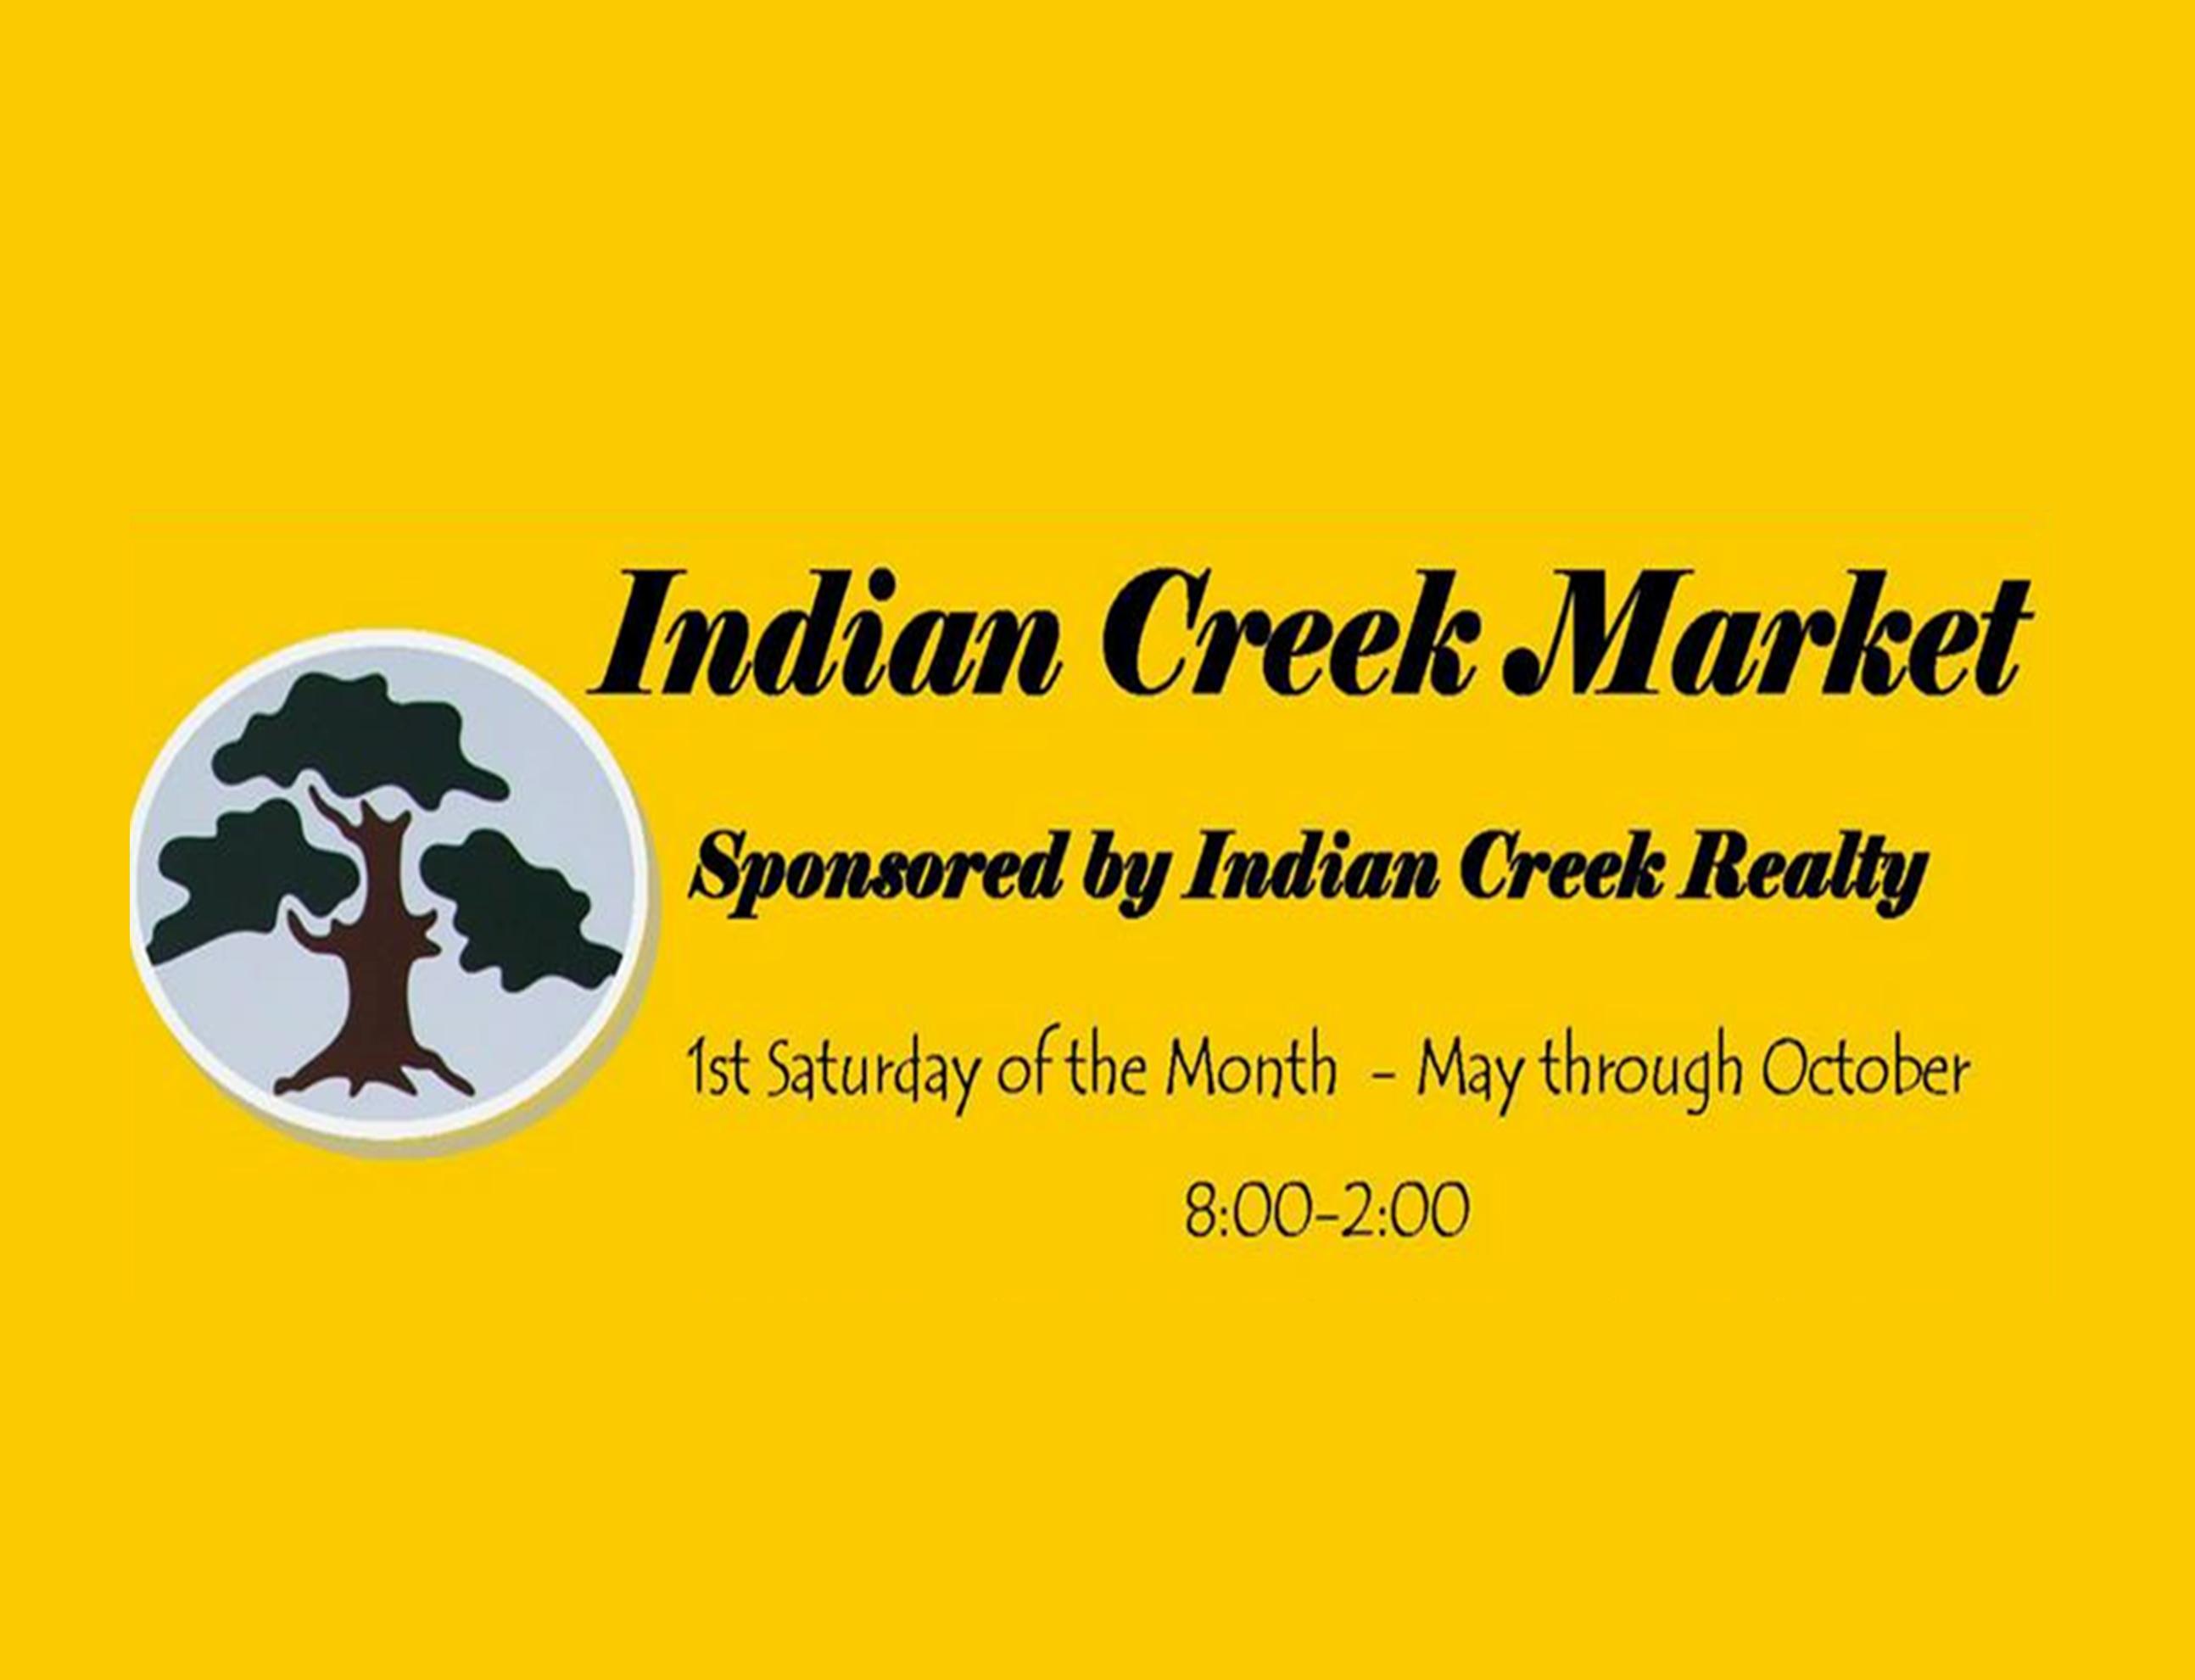 Indian Creek Market